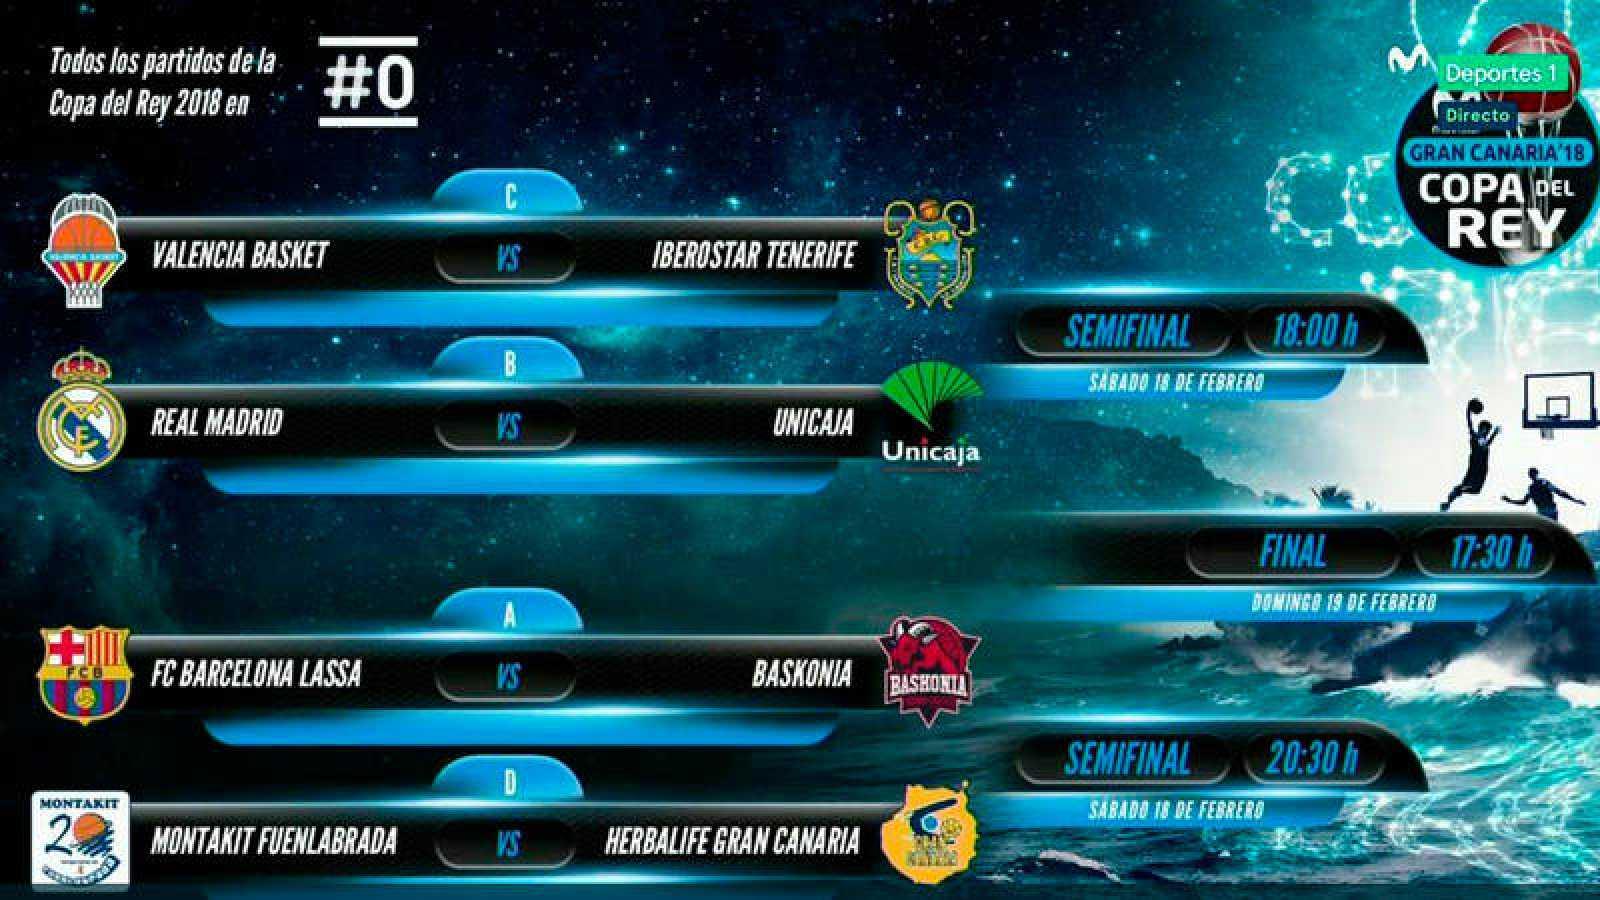 Baloncesto | Copa del Rey | Real Madrid-Unicaja, Barça-Baskonia ...